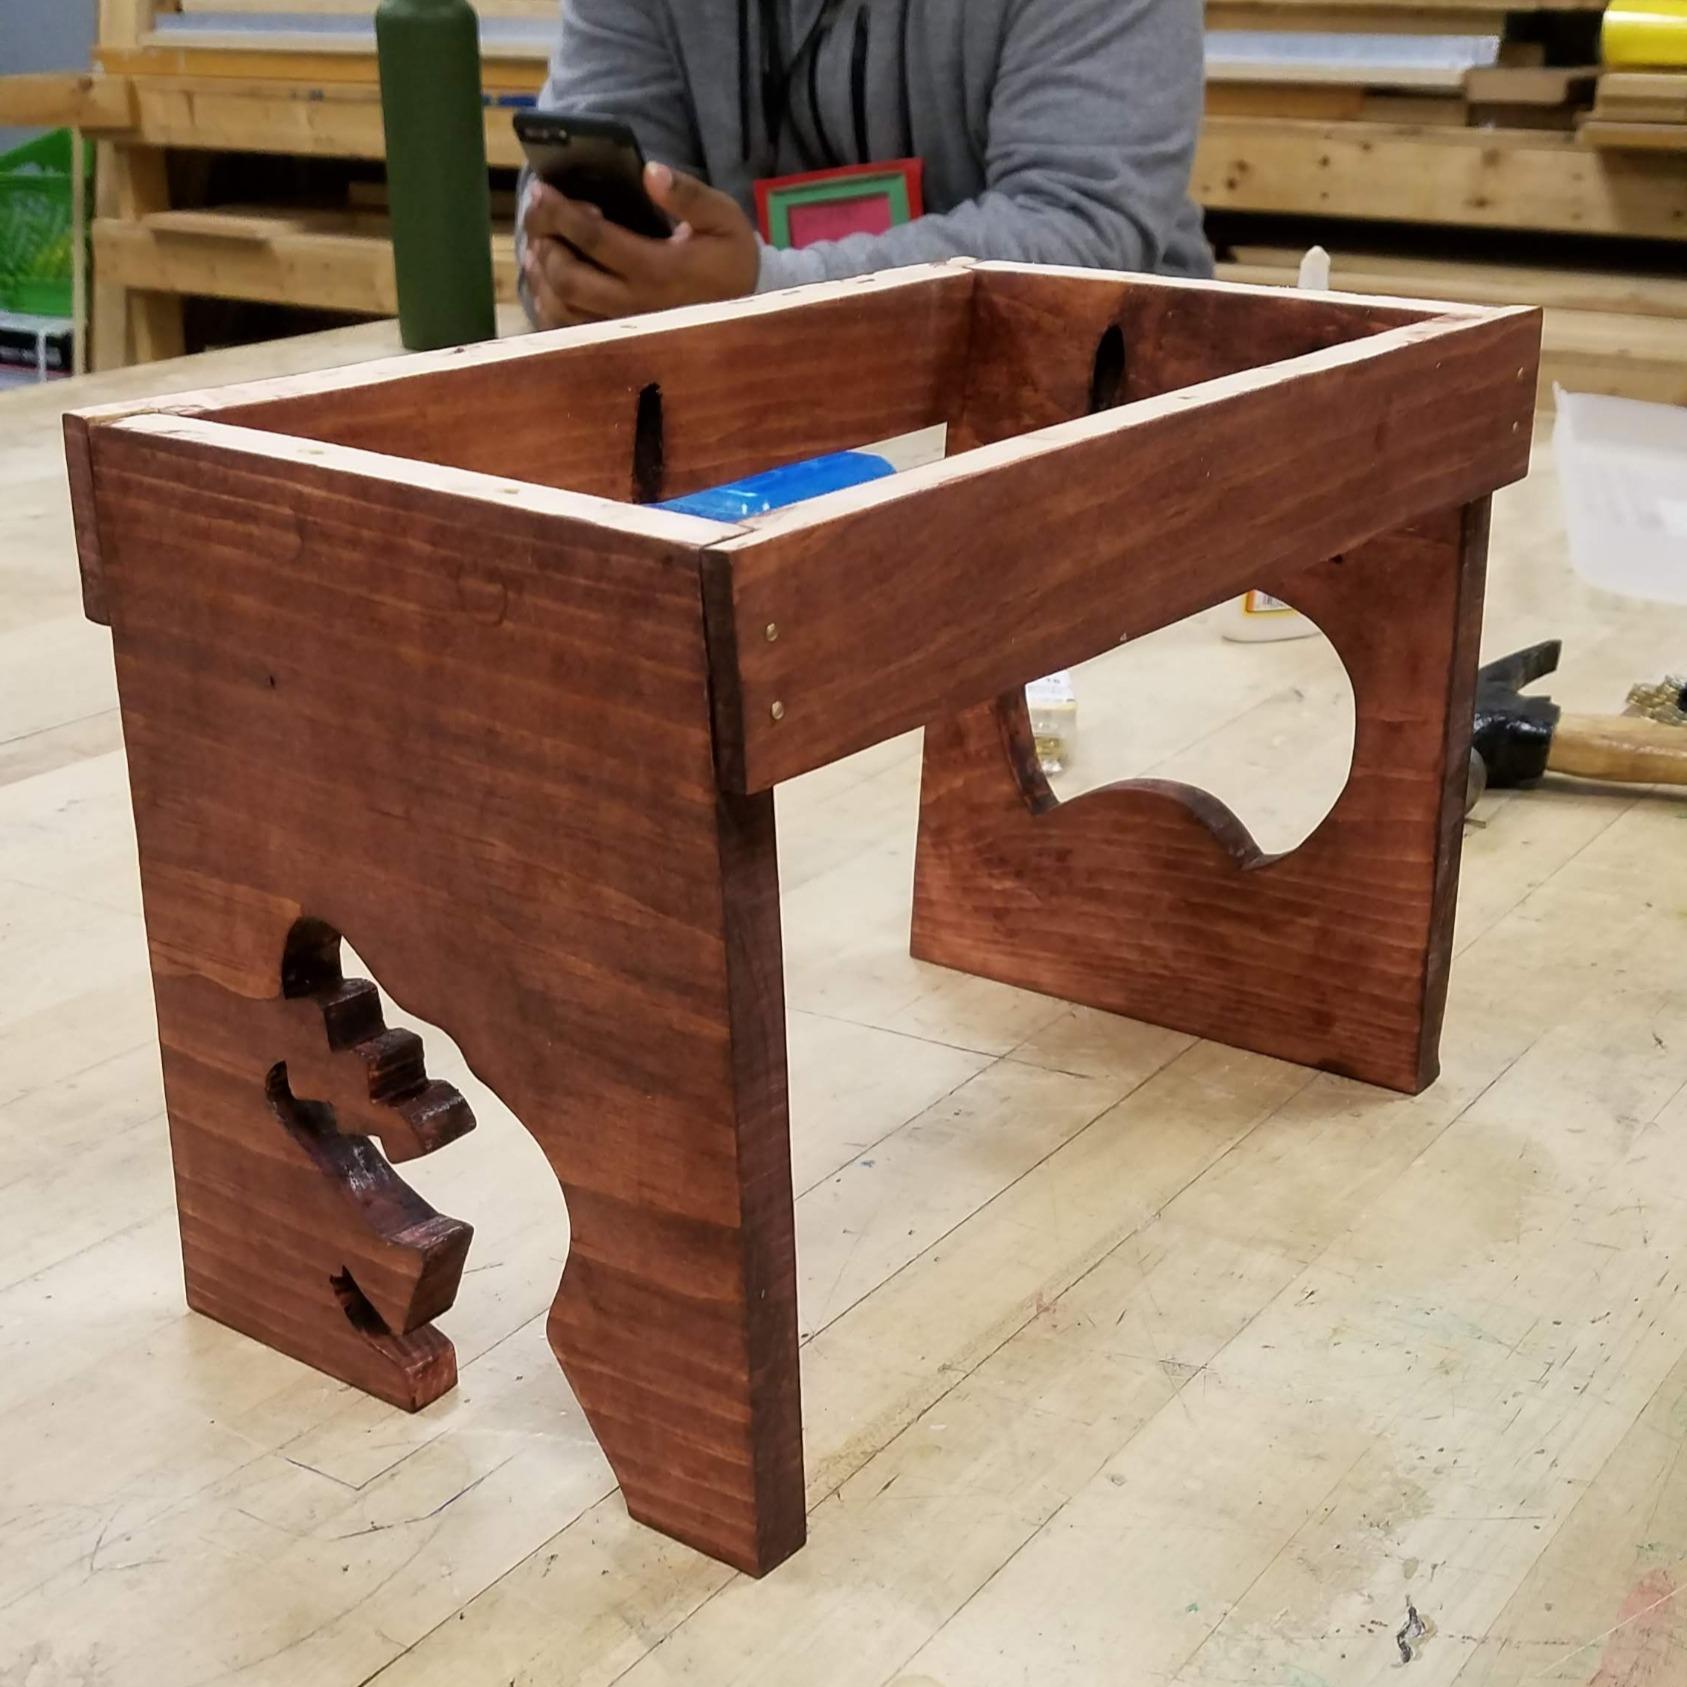 t-rex, dinosaur, kids, woodworking, tech ed, school project, wood shop, brontosaurus, pocket holes, kreg jig, stain, brass, tacks, nails, stain, finished wood, accent, metal, wood grain, dark brown